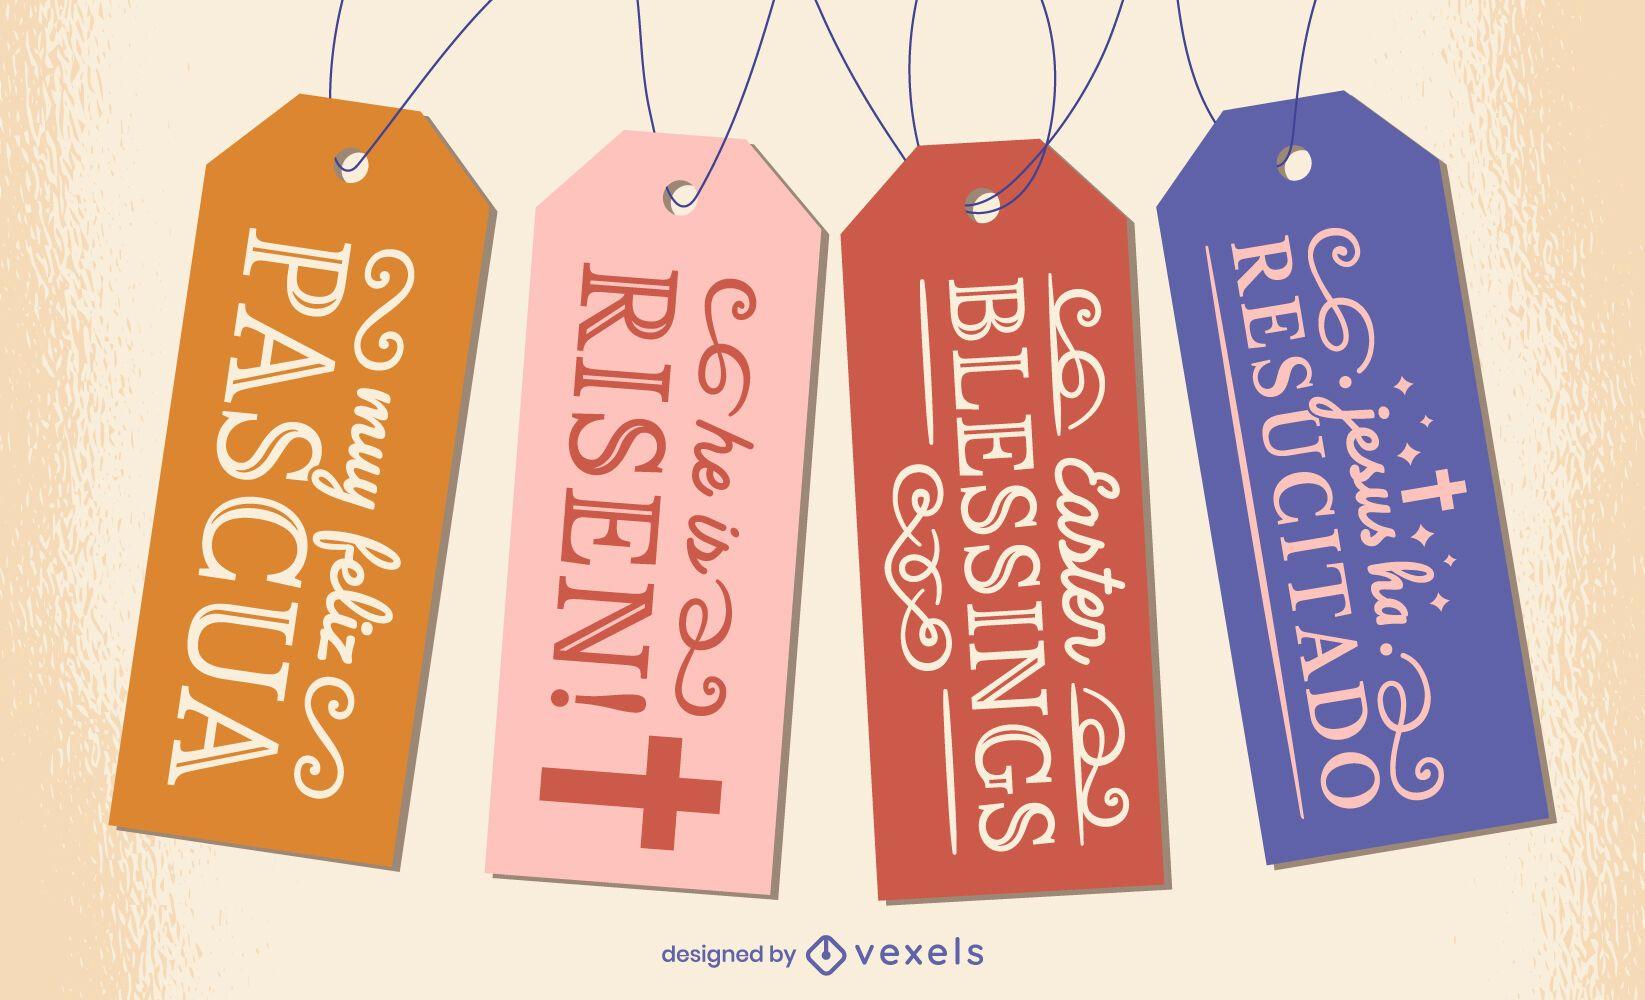 Conjunto de etiquetas colgantes de cristianismo religioso